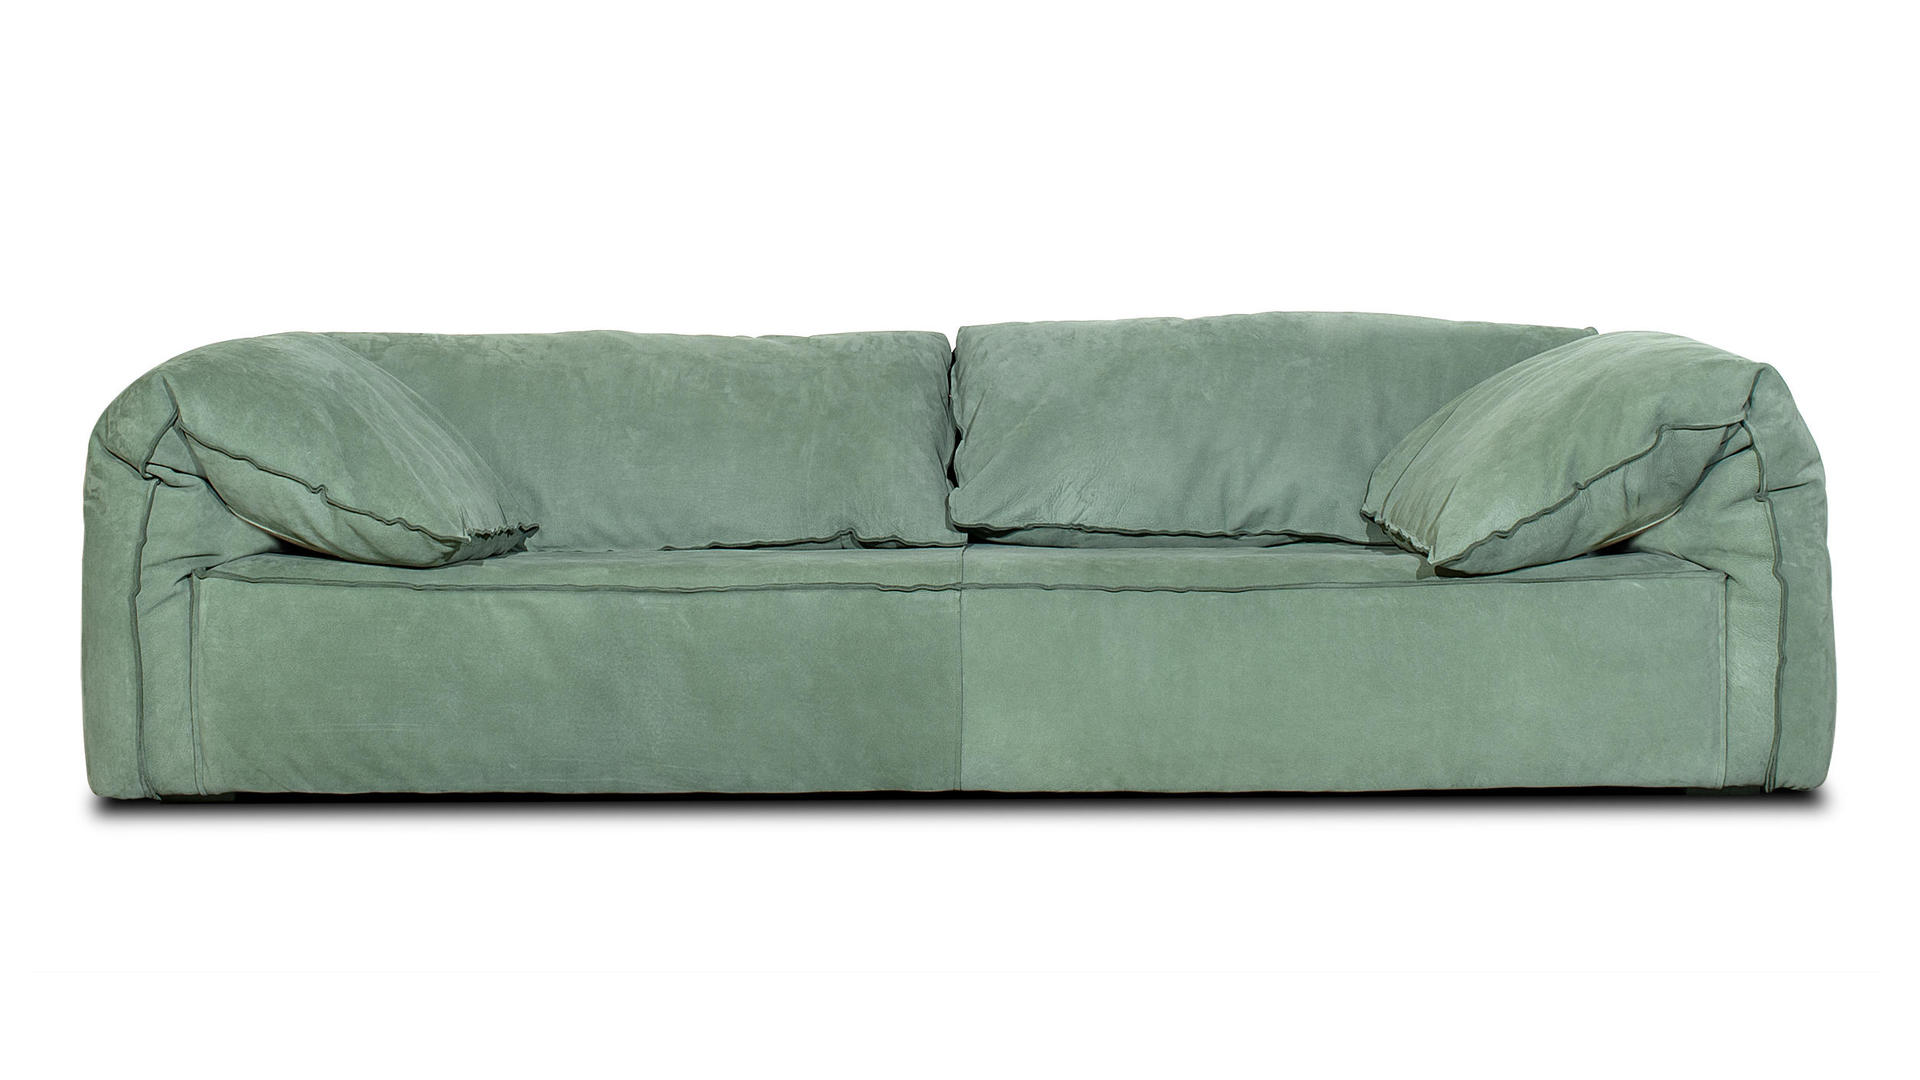 Baxter Casablanca sofa 2.jpg